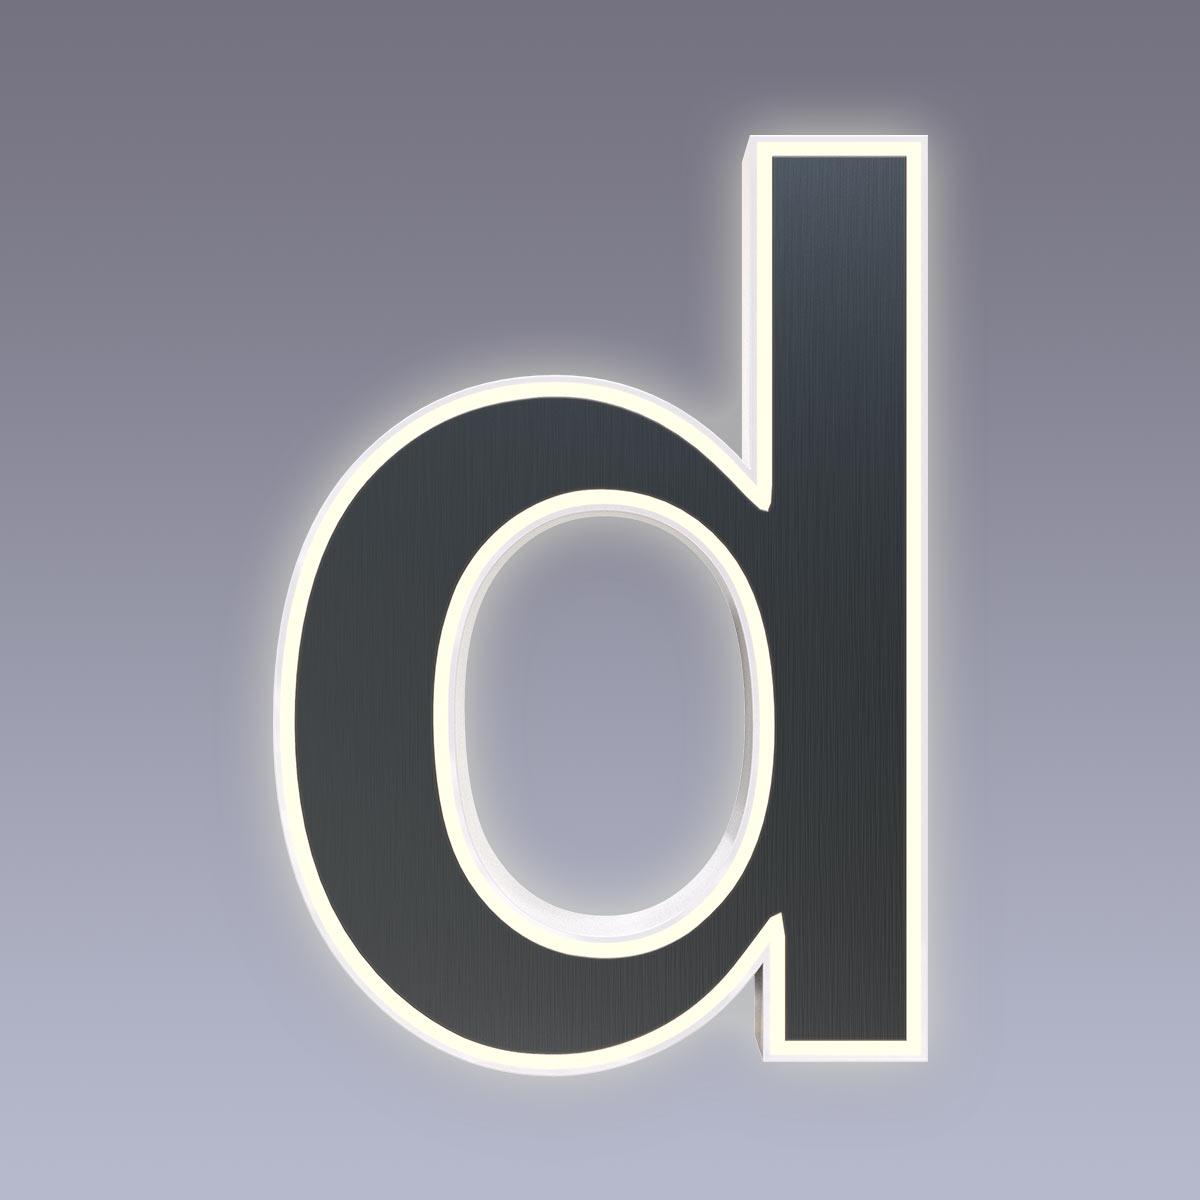 Cover für 15cm Hausnummer d Edelstahl anthrazit RAL7016 Arial selbstklebend